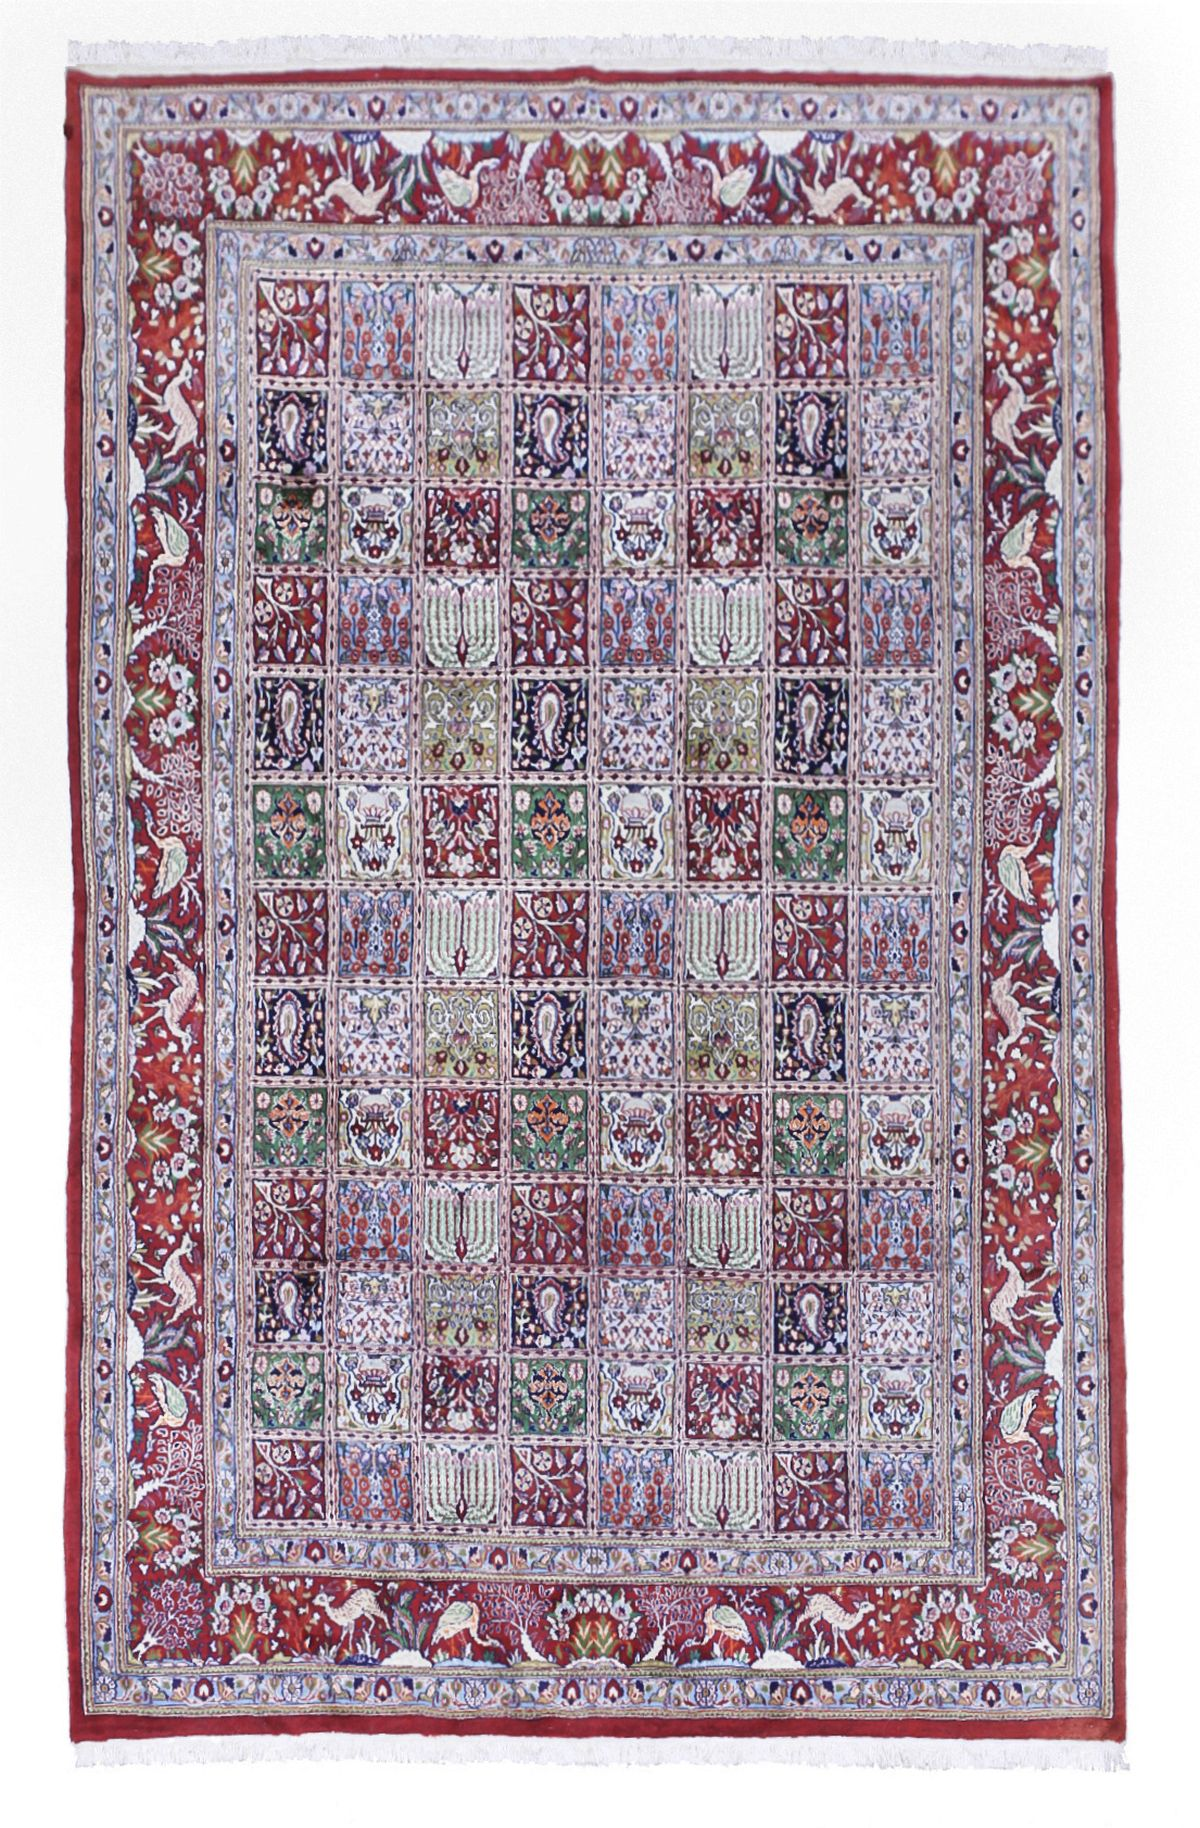 #171 Carpet Tabriz | Teppich TÄBRIS Image